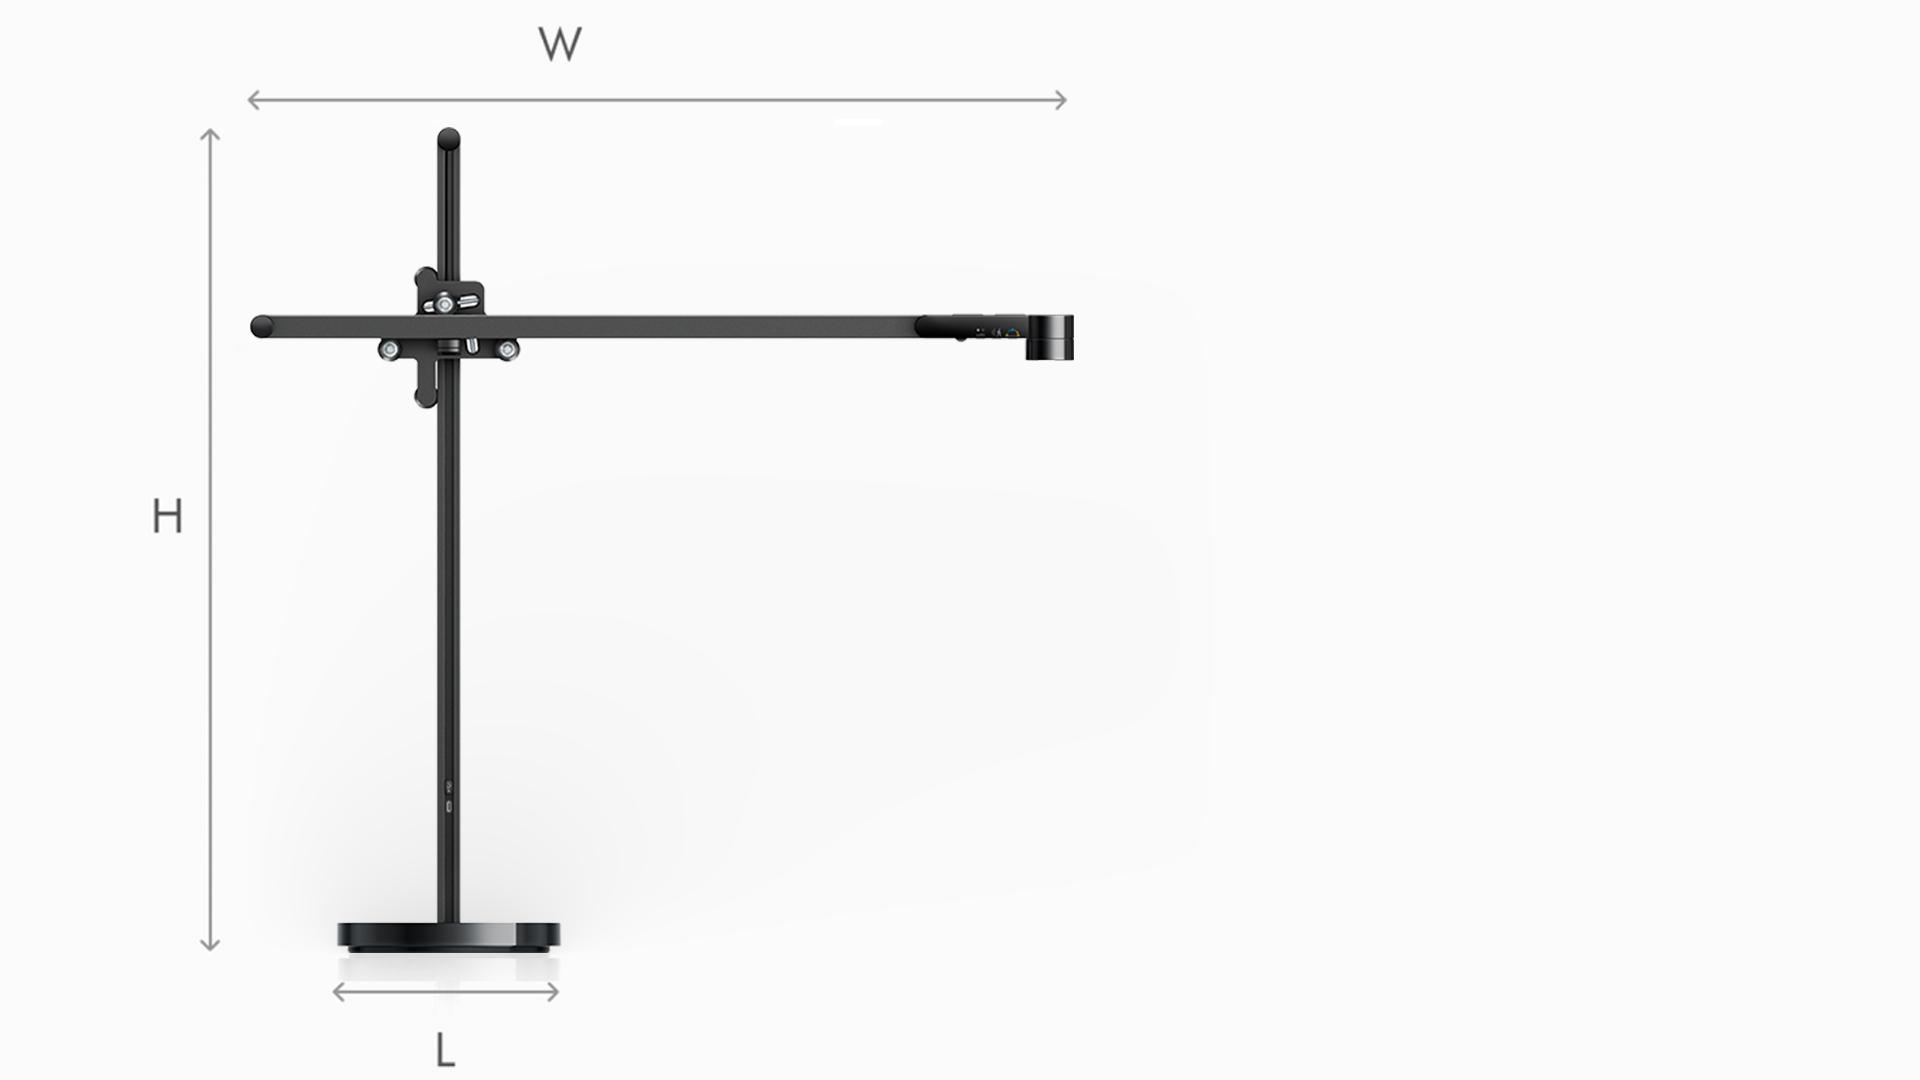 Illustration of Dyson Lightcycle black task light dimensions